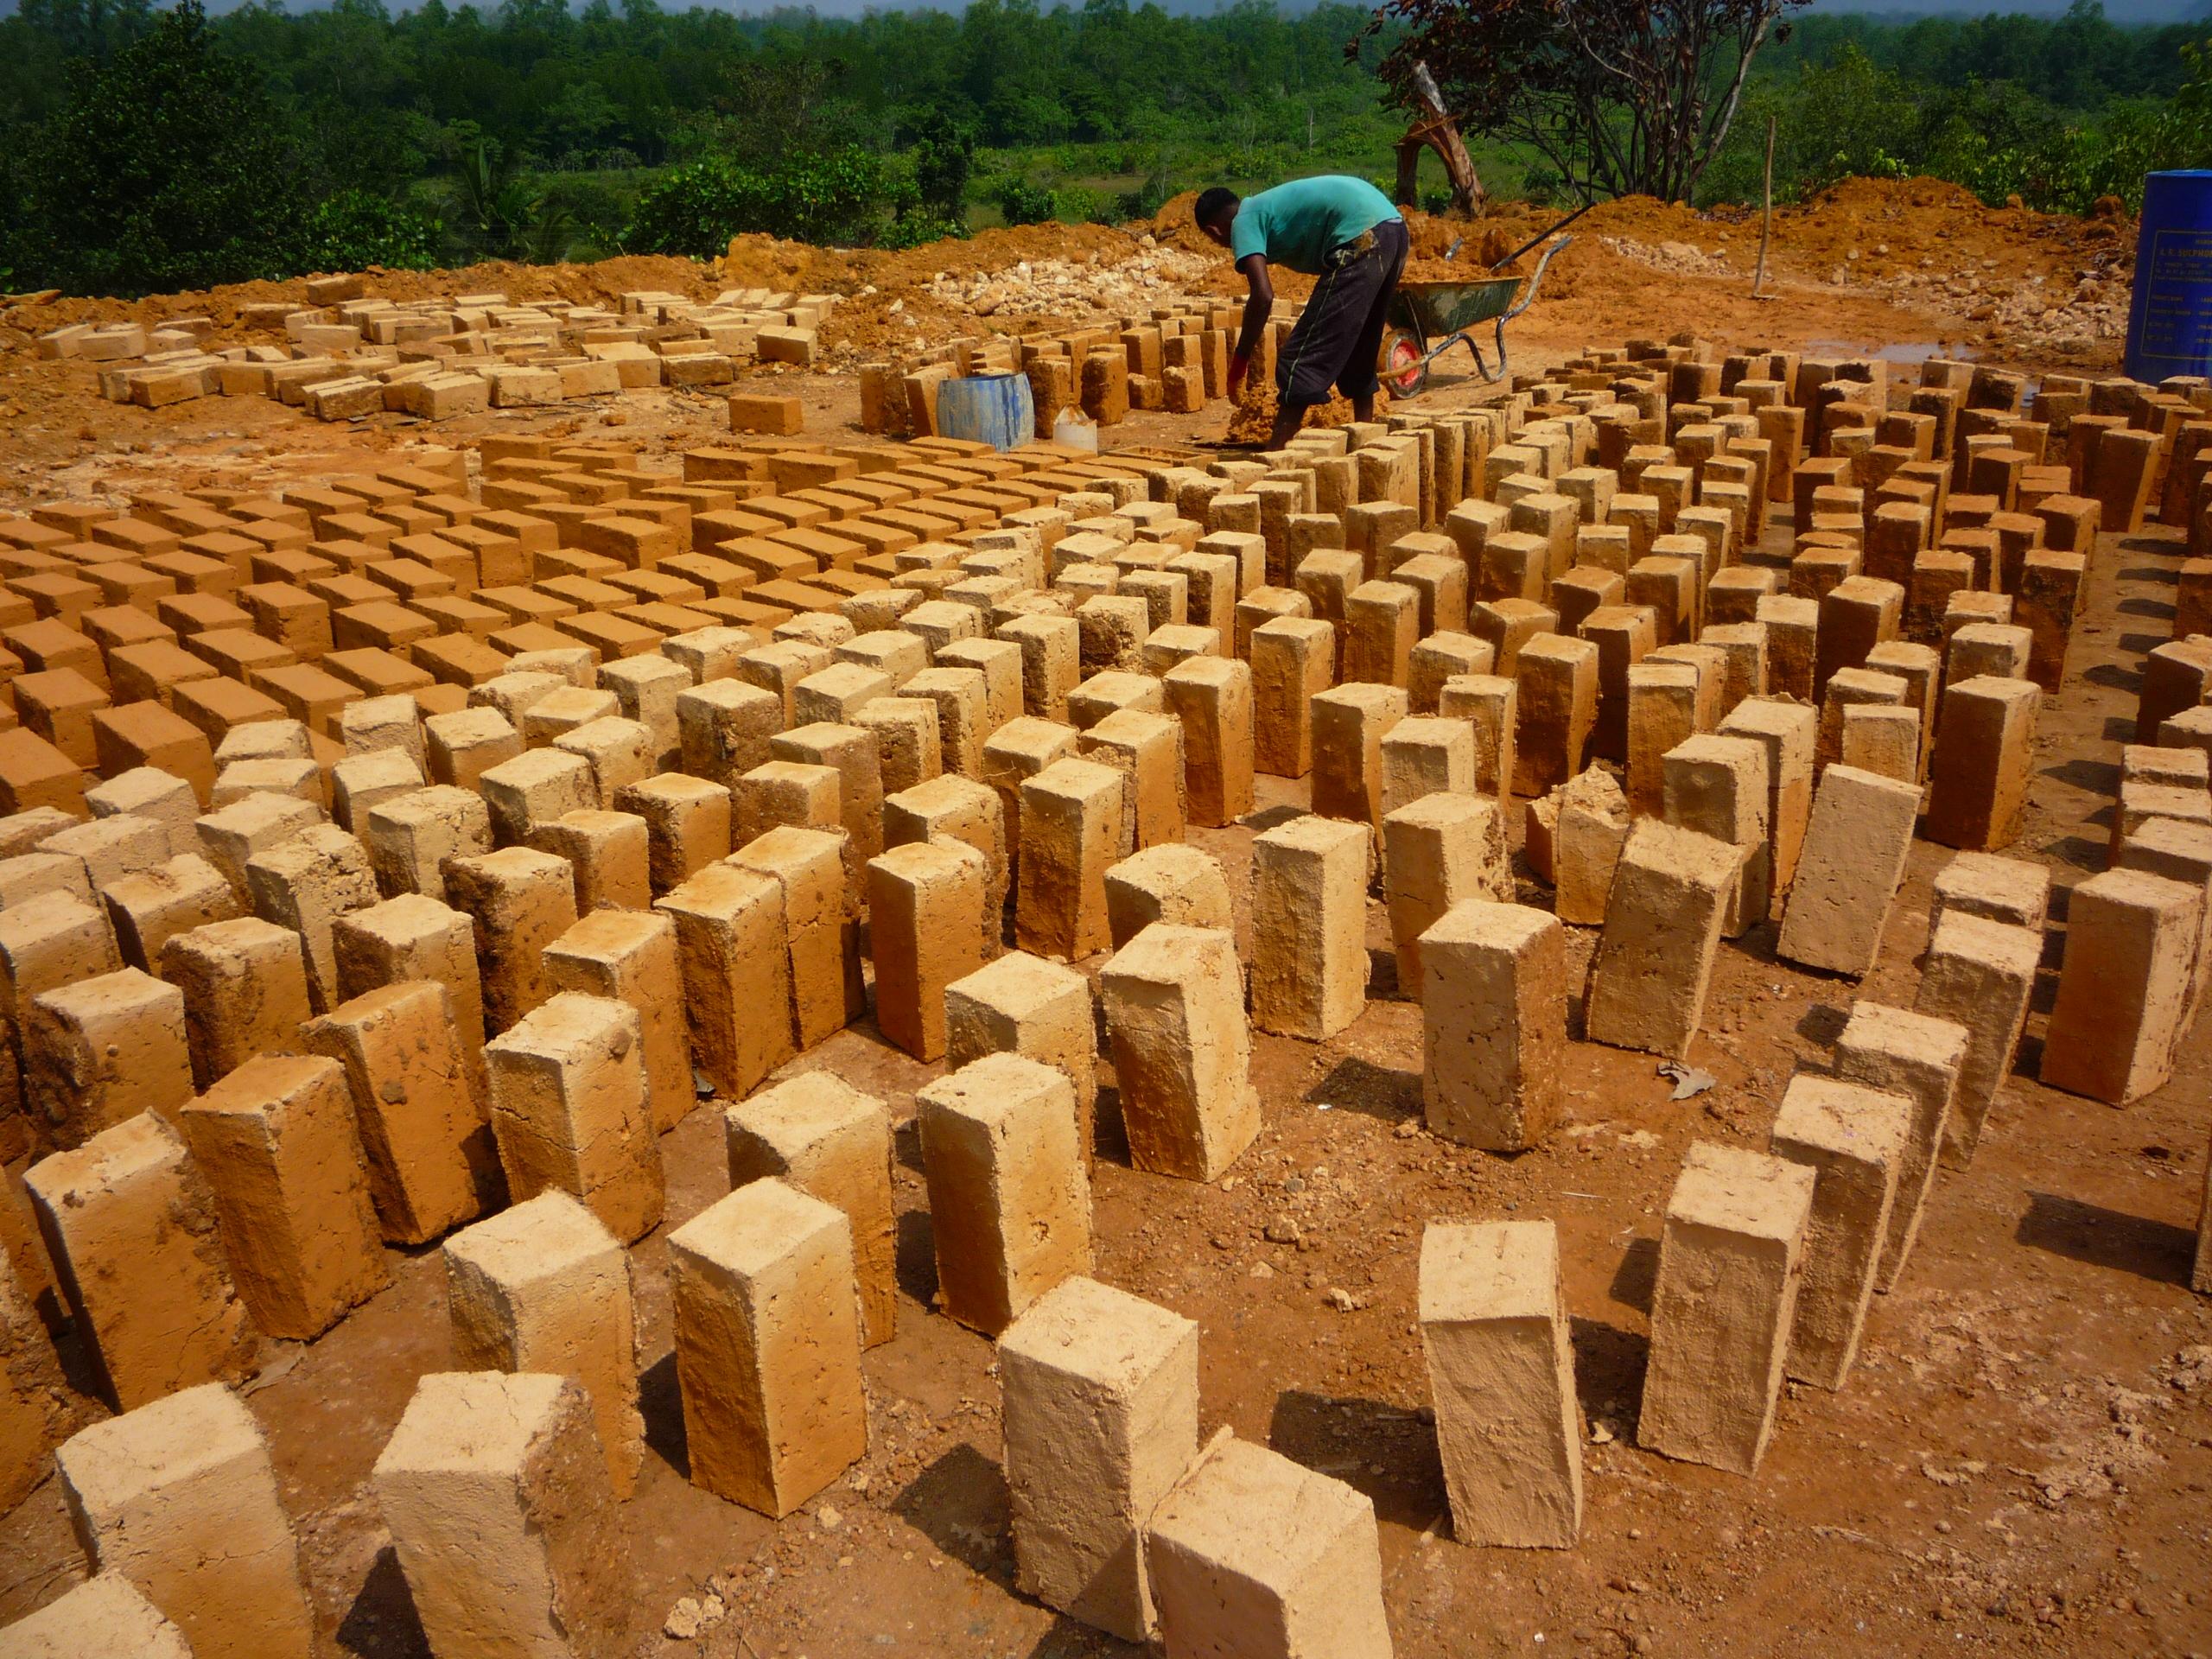 Making clay bricks our own